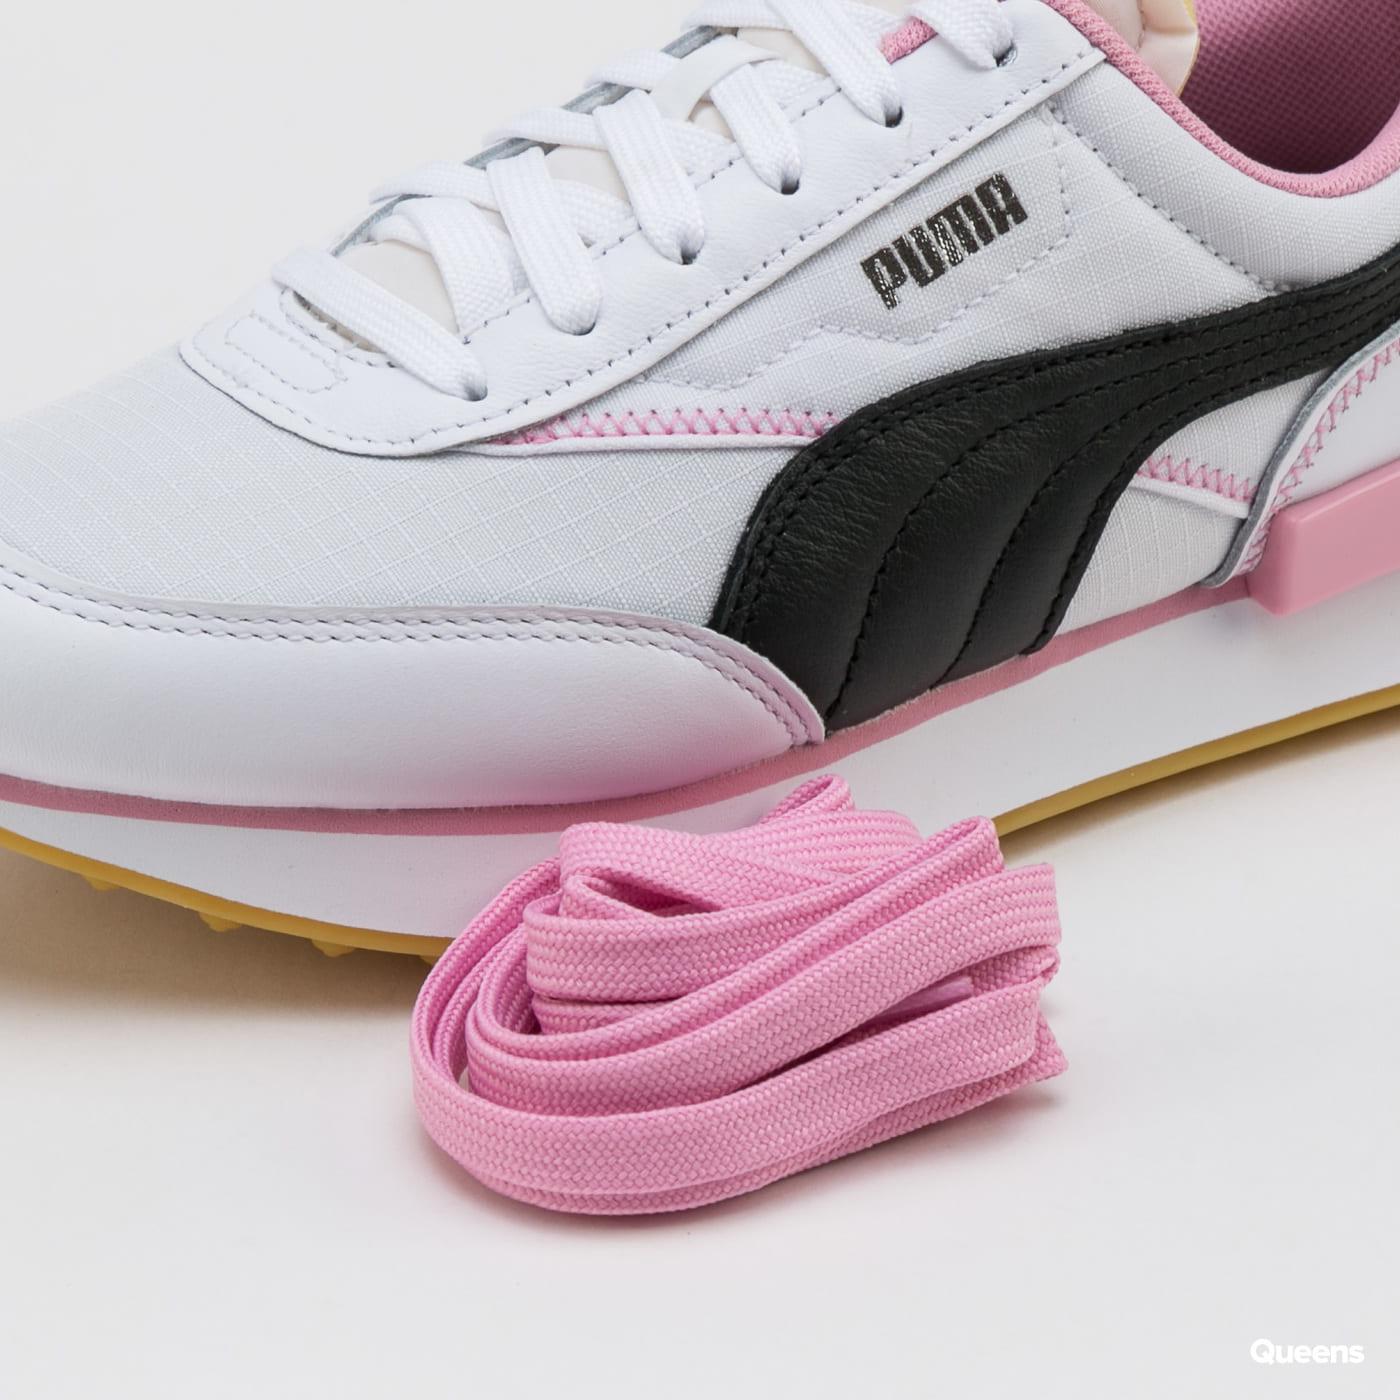 Puma Future Rider Von Dutch Wn's puma white